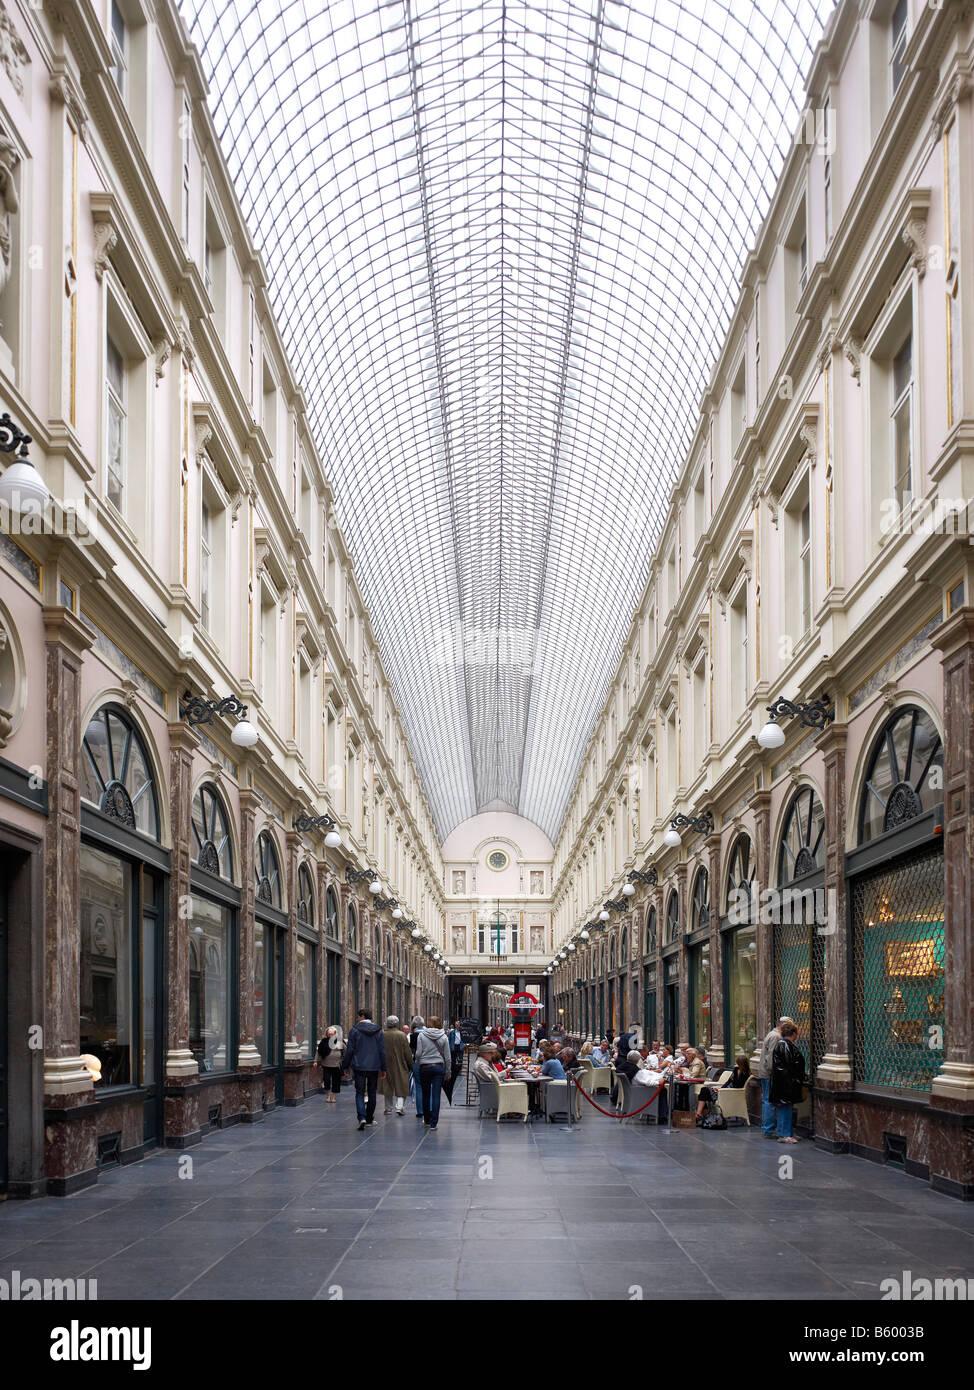 Galeries Royales Saint Hubert Brussels Brabant Belgium - Stock Image